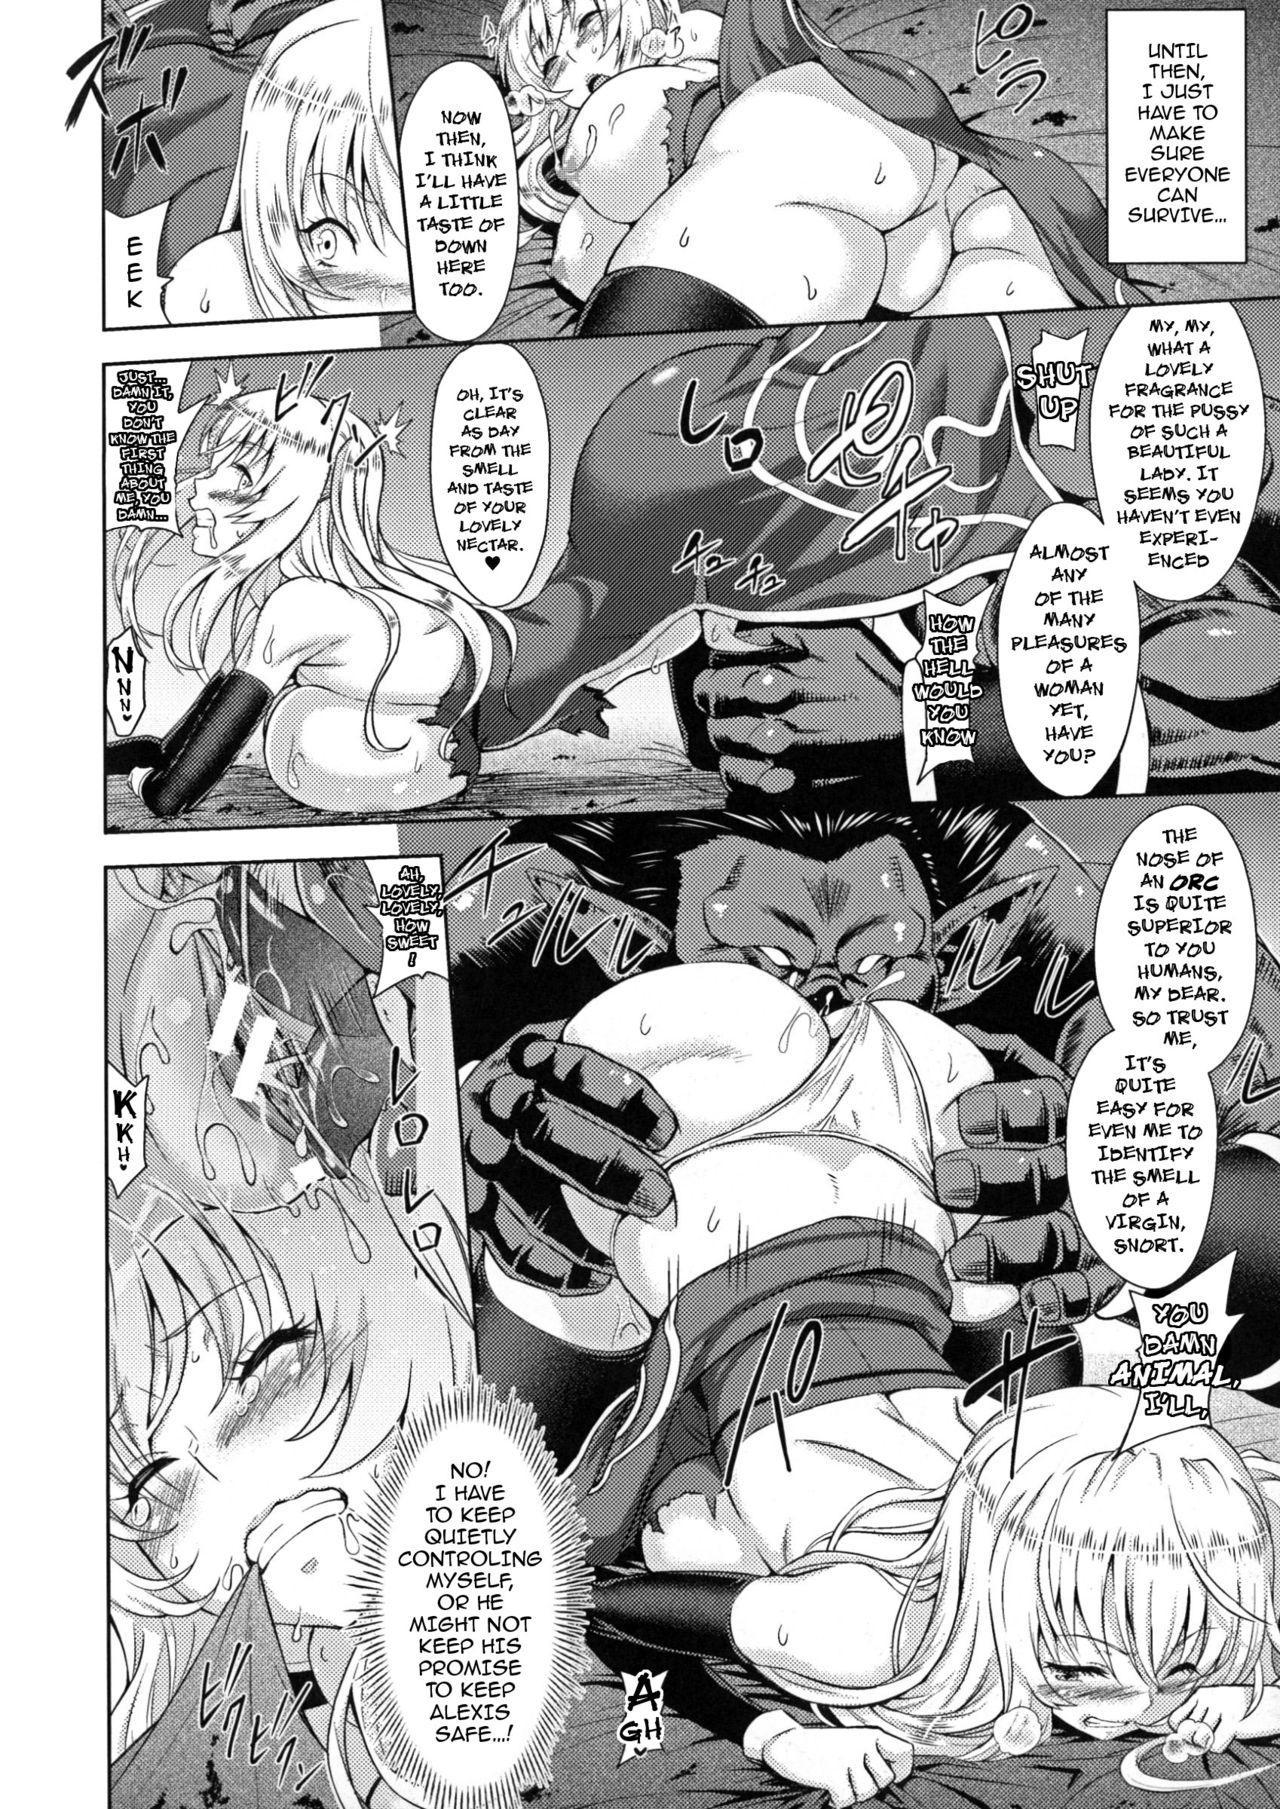 [Yamada Gogogo] Erona ~Orc no Inmon ni Okasareta Onna Kishi no Matsuro~   Erona ~The Fall of a Beautiful Knight Cursed with the Lewd Mark of an Orc~ Ch. 1-6 [English] {darknight} 14